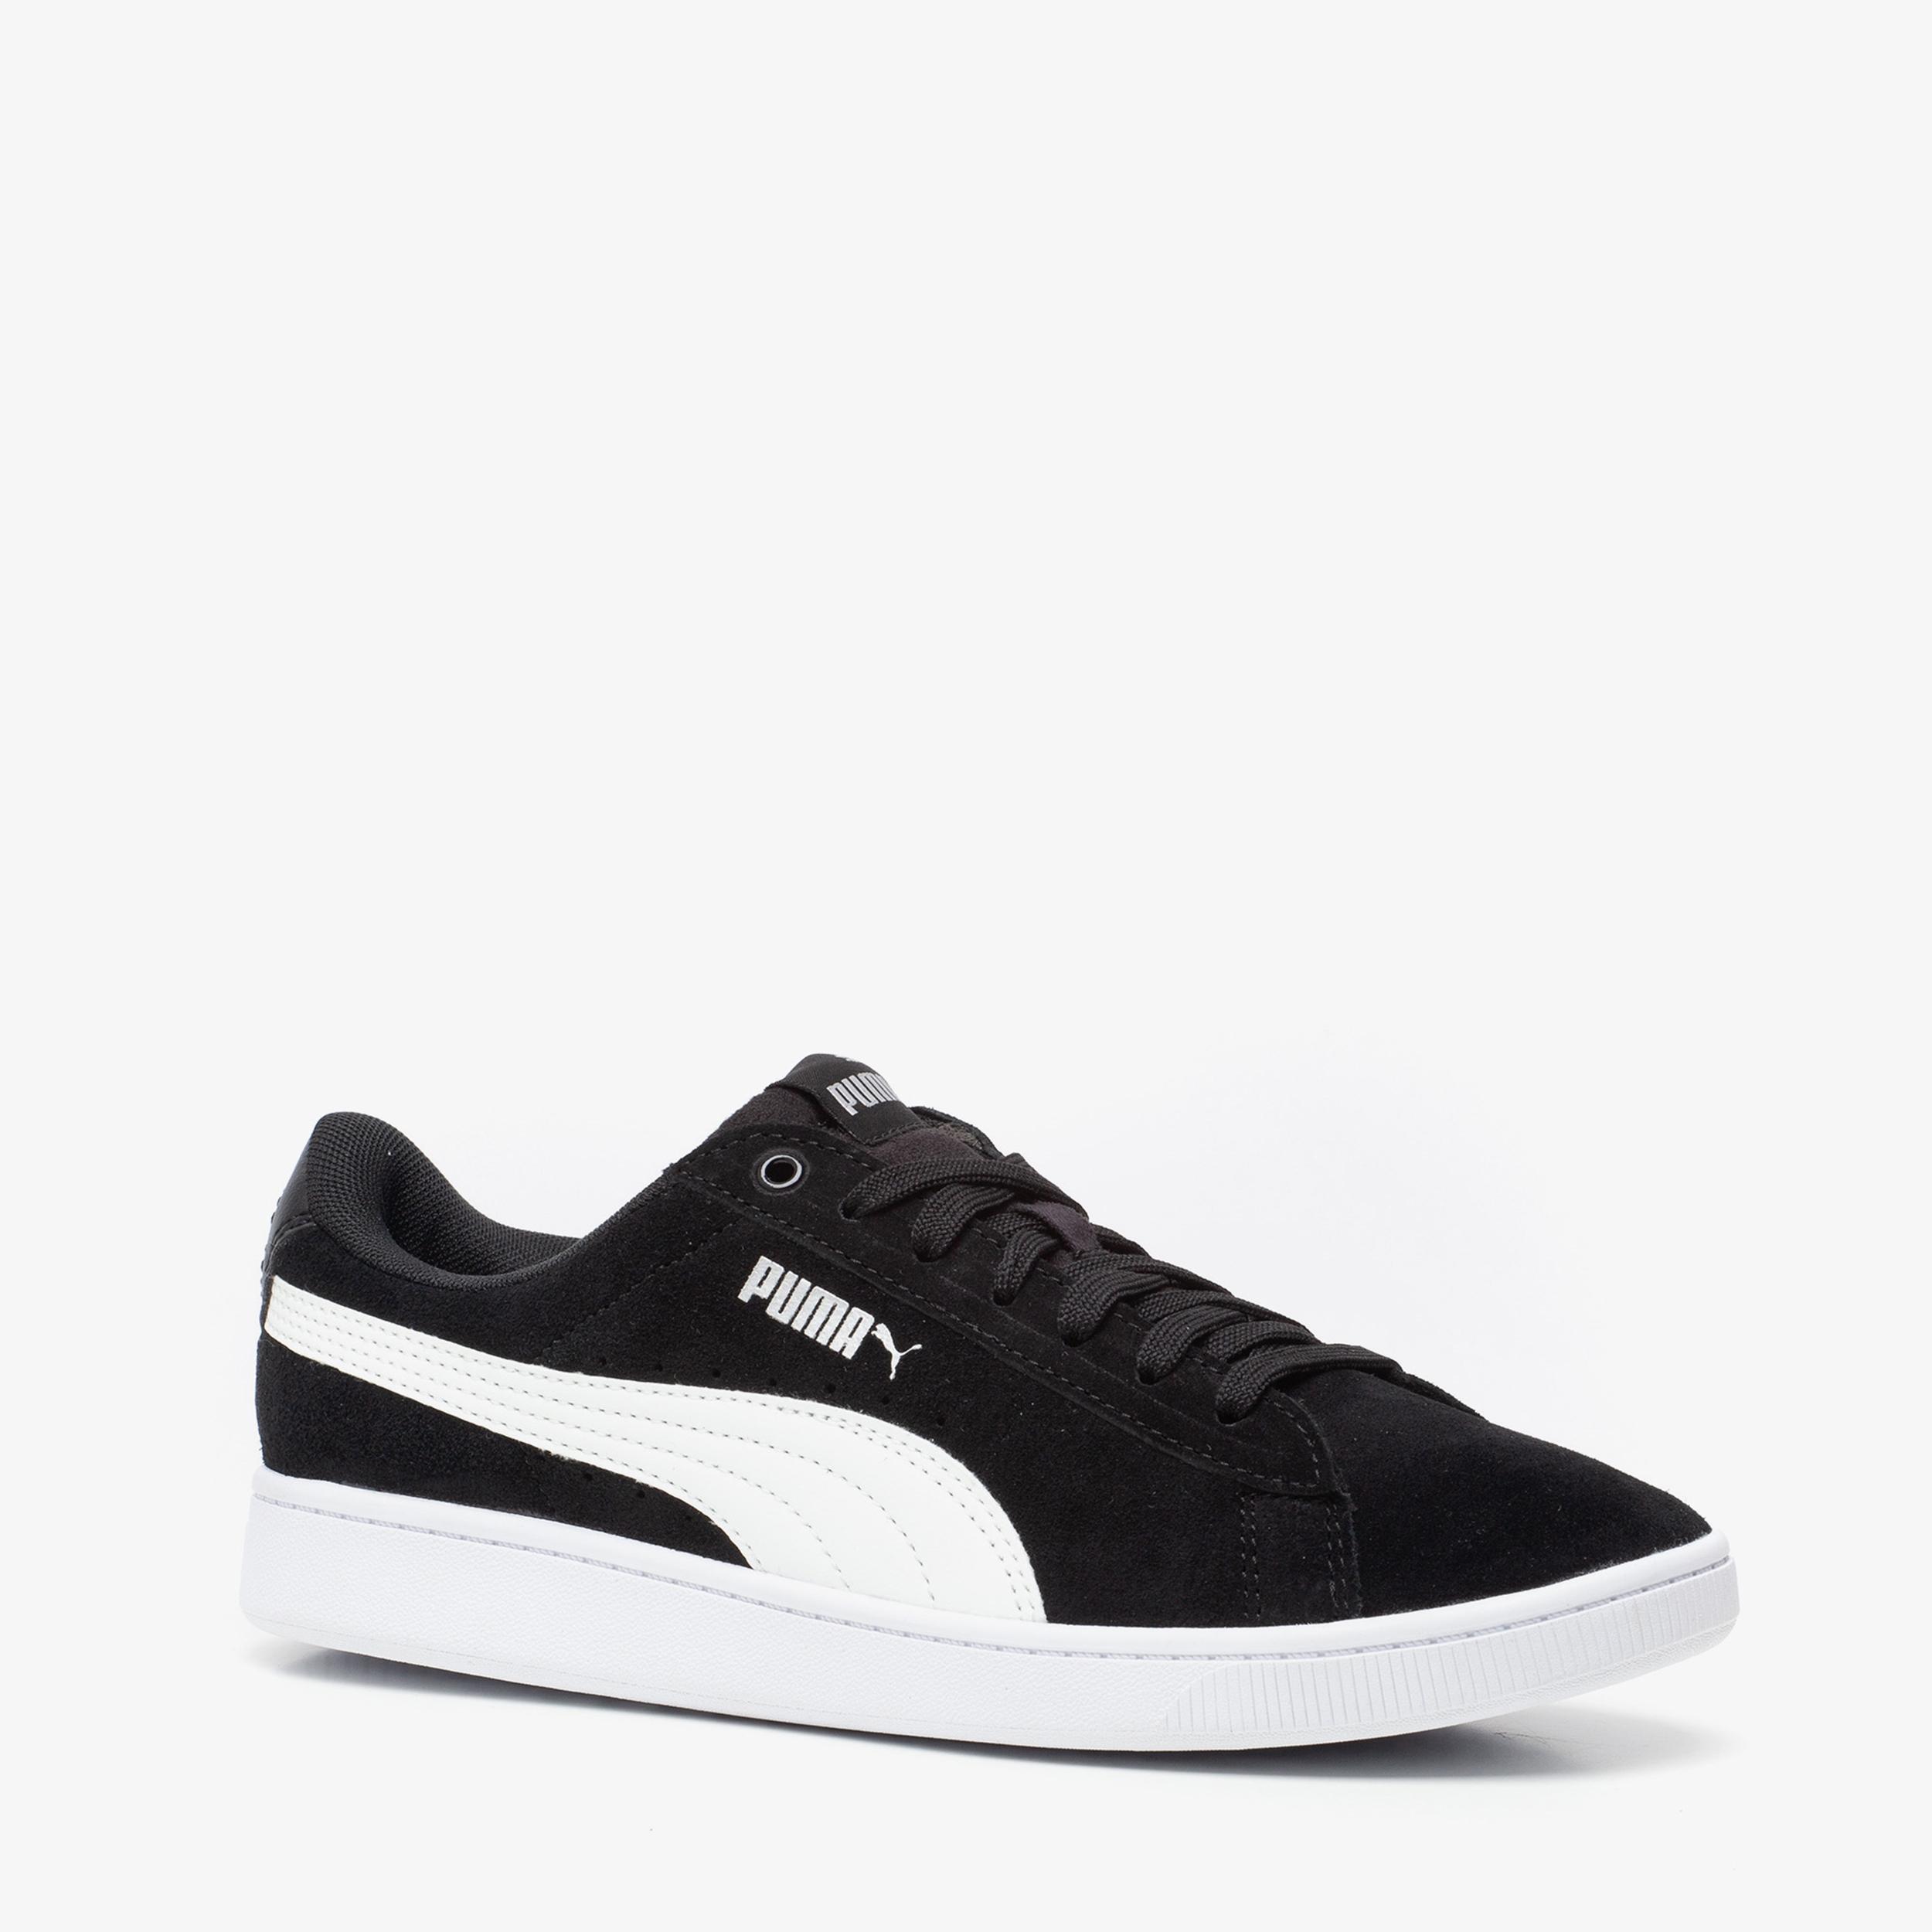 Puma Vikky dames sneakers